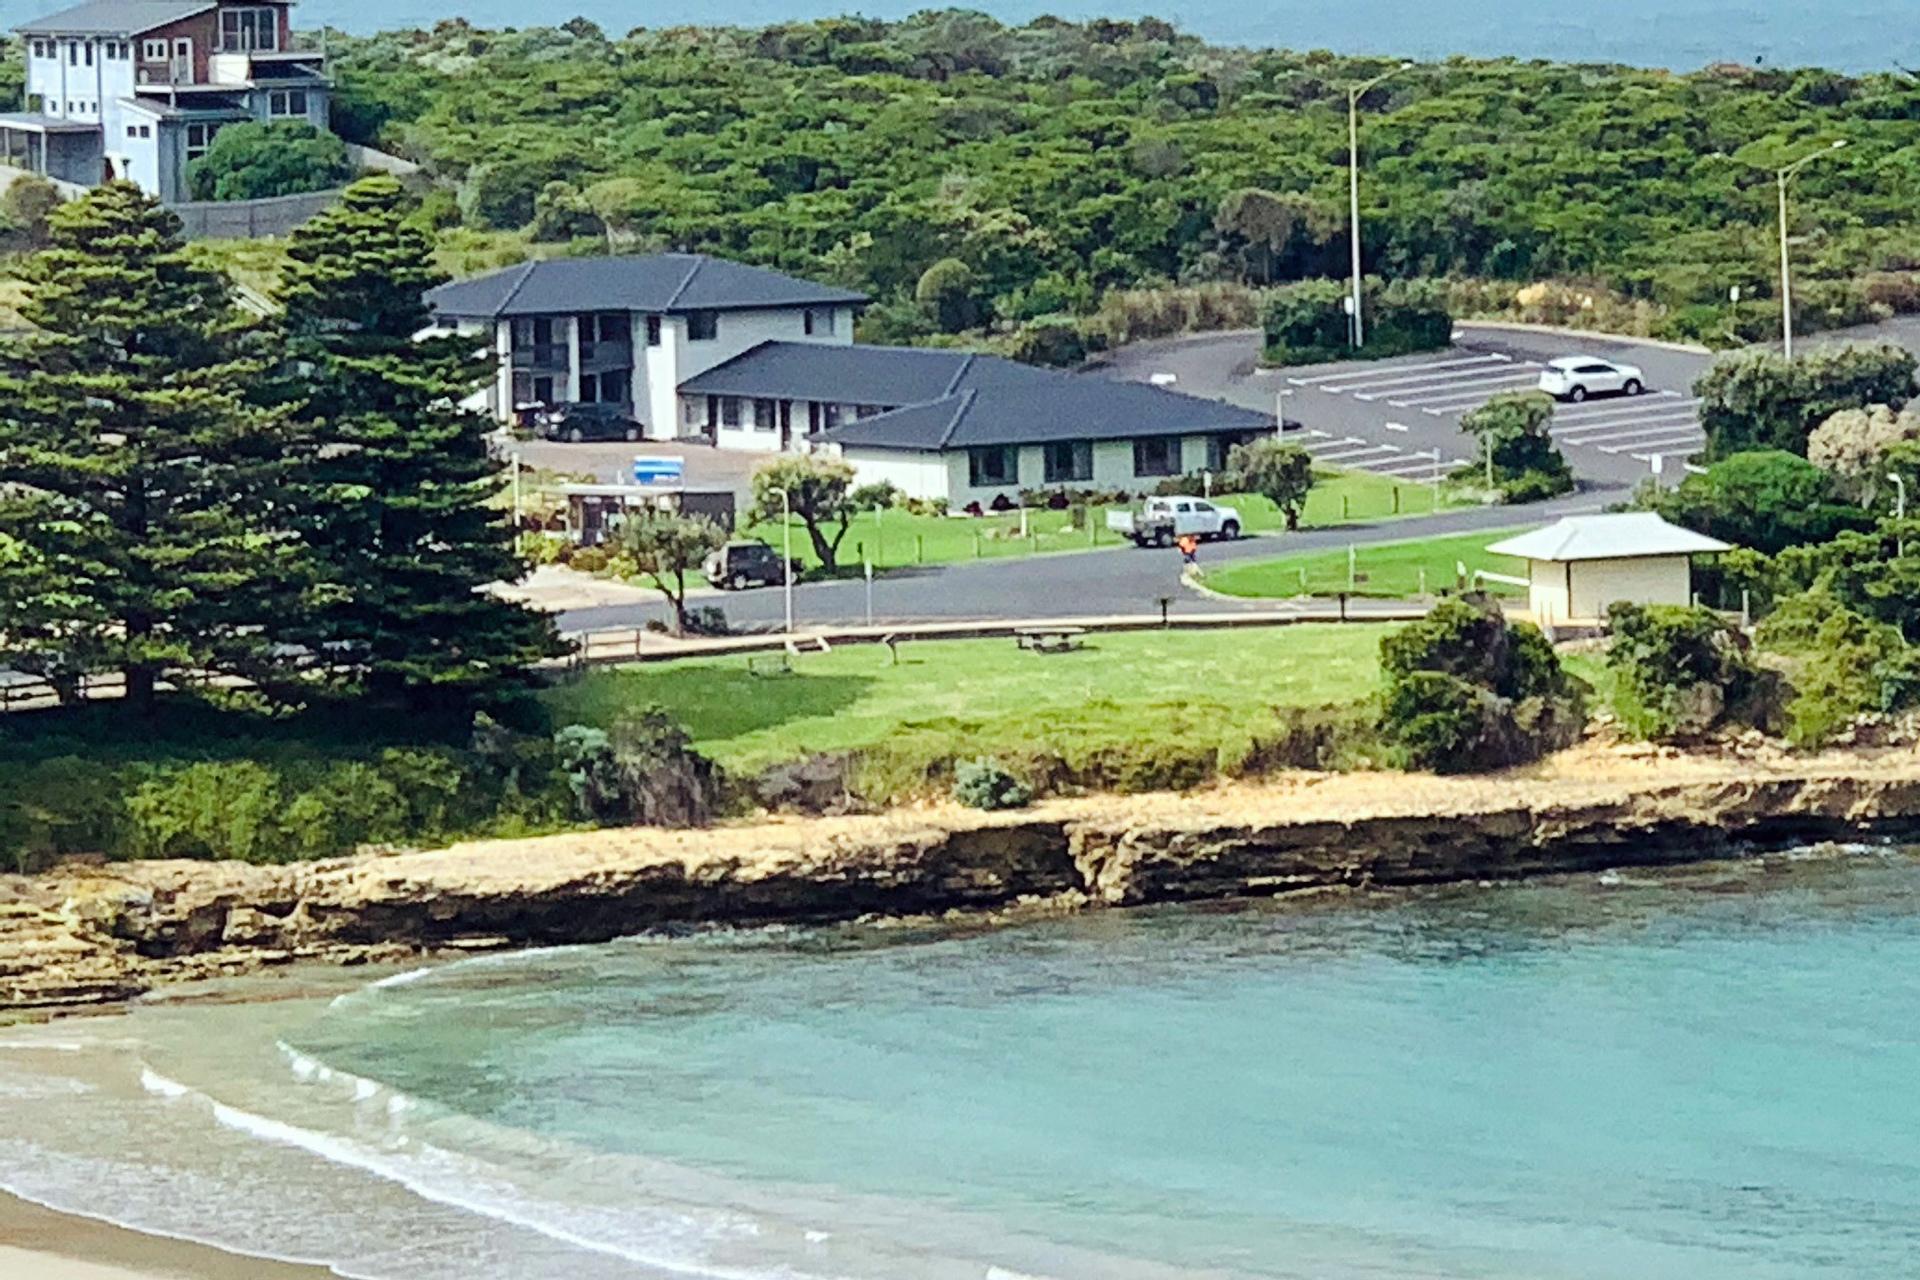 l - Southern Ocean Motor Inn